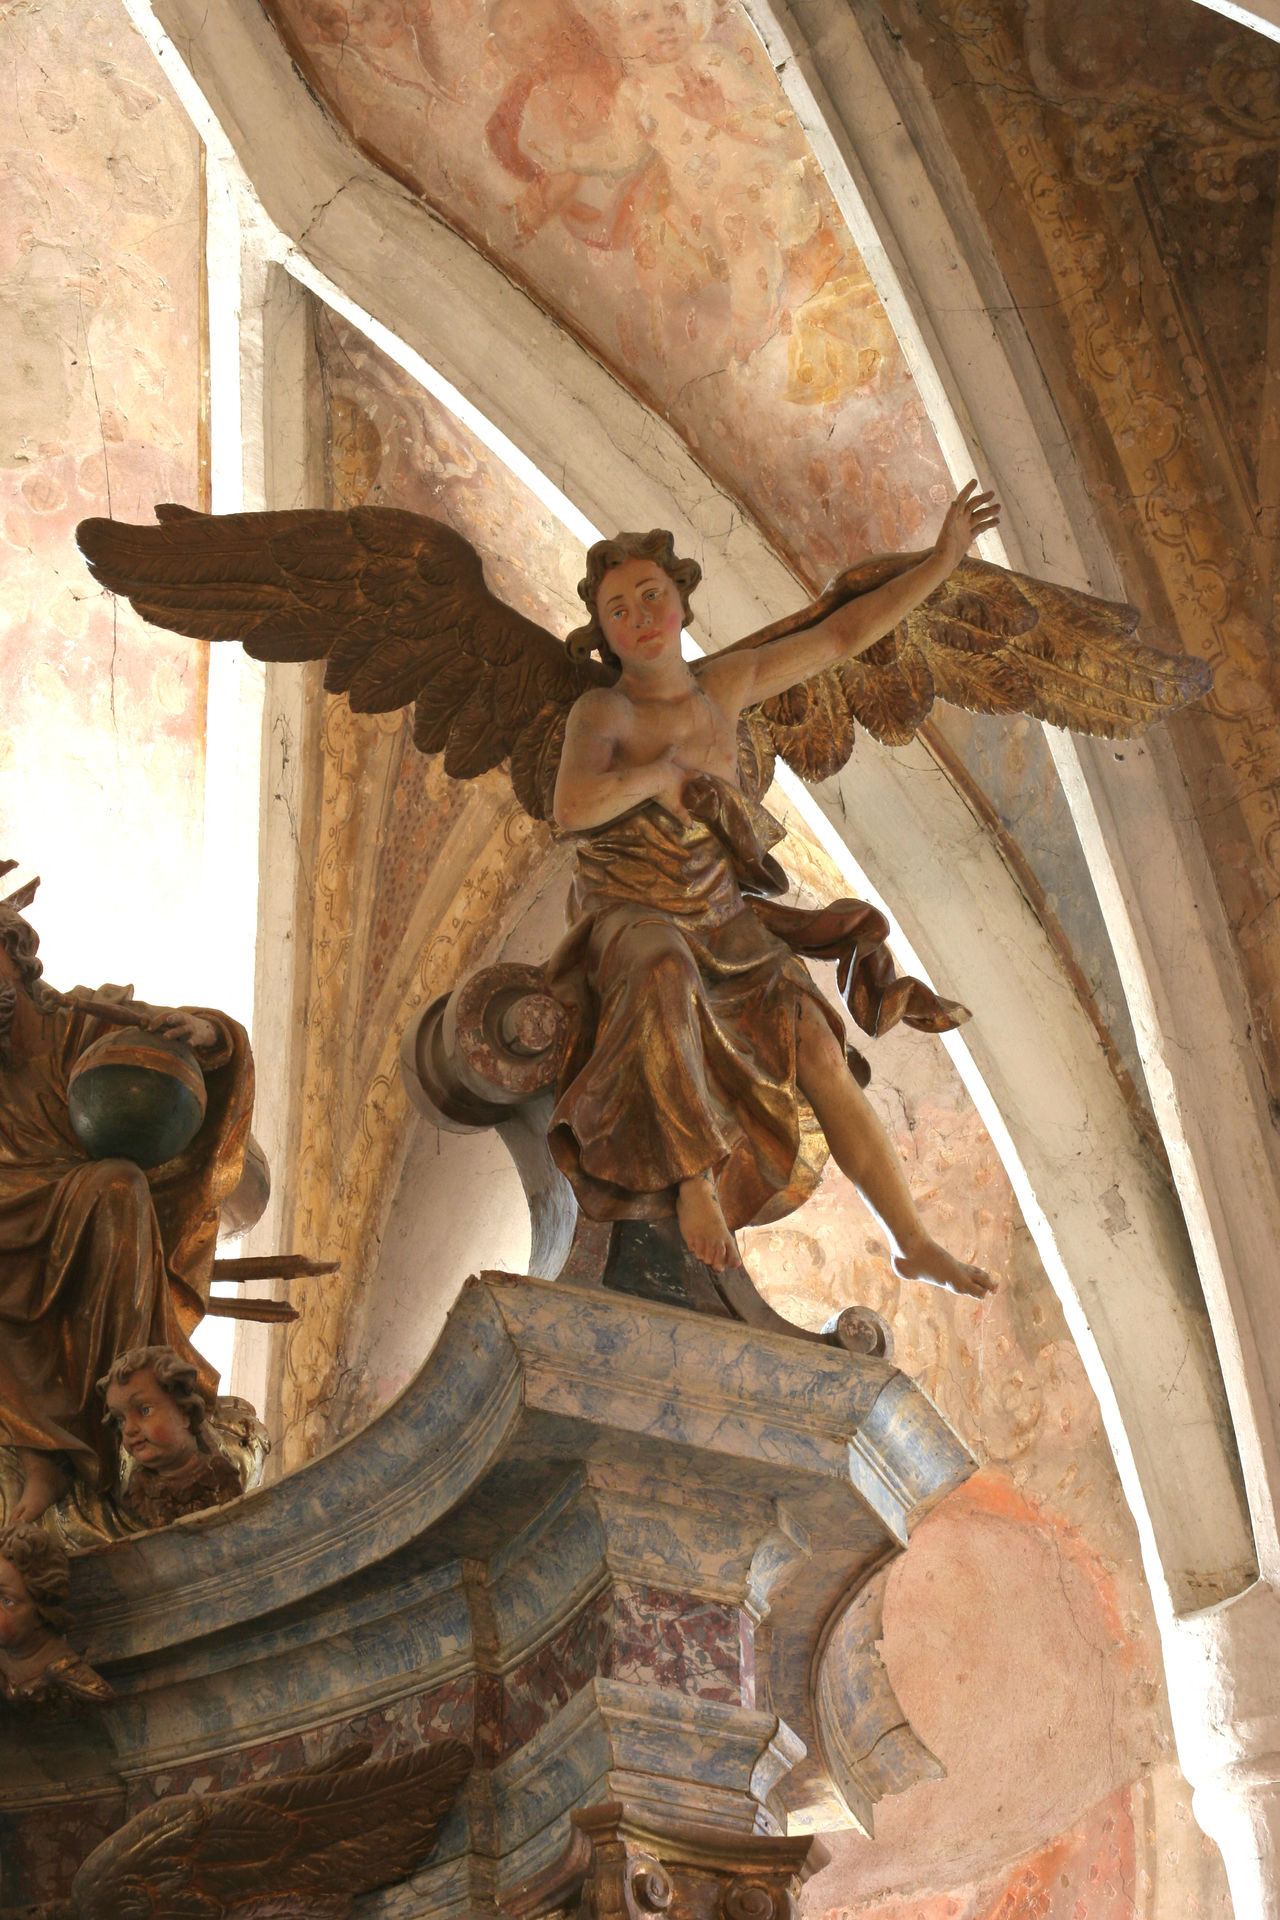 Angel Altar Angel Antique Art Belief Christianity .. Church Confession Croatia Europe Faith Gold Gospel Historical Holy Old Pray Religion Religious  Saint Sculpture Spirituality Statue Worship